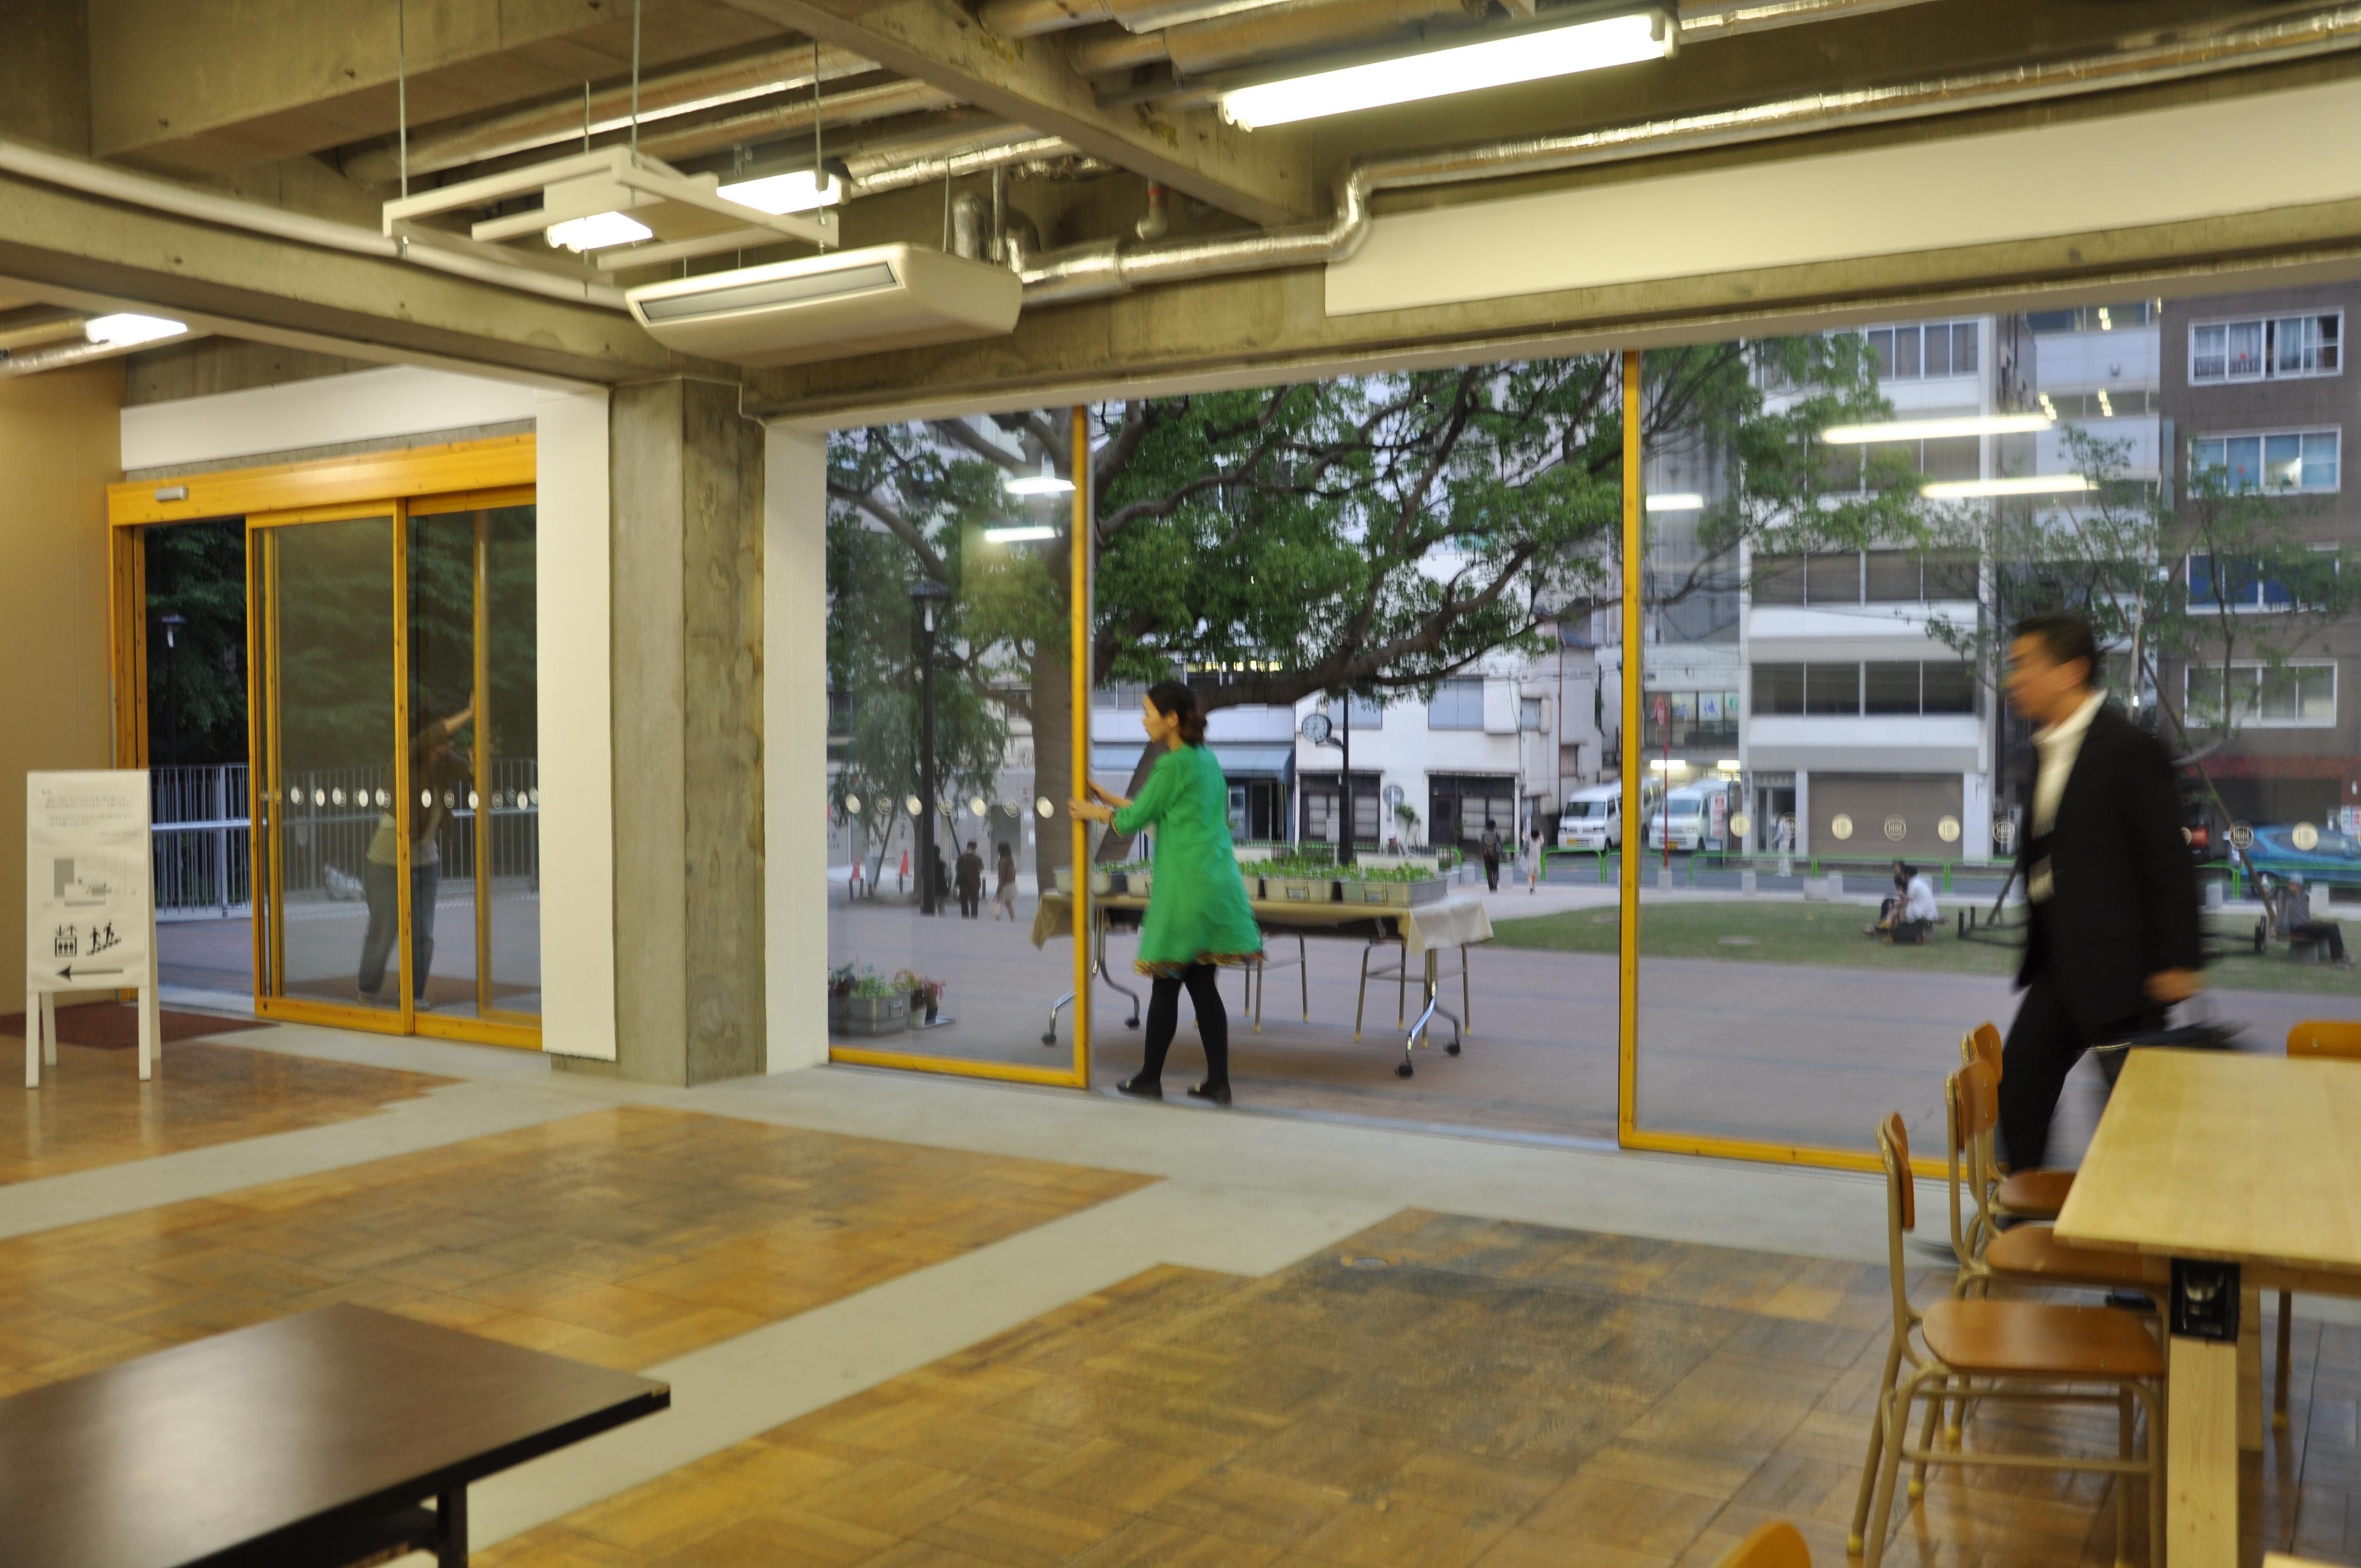 http://blog.3331.jp/staff/file/DSC_2490.JPG